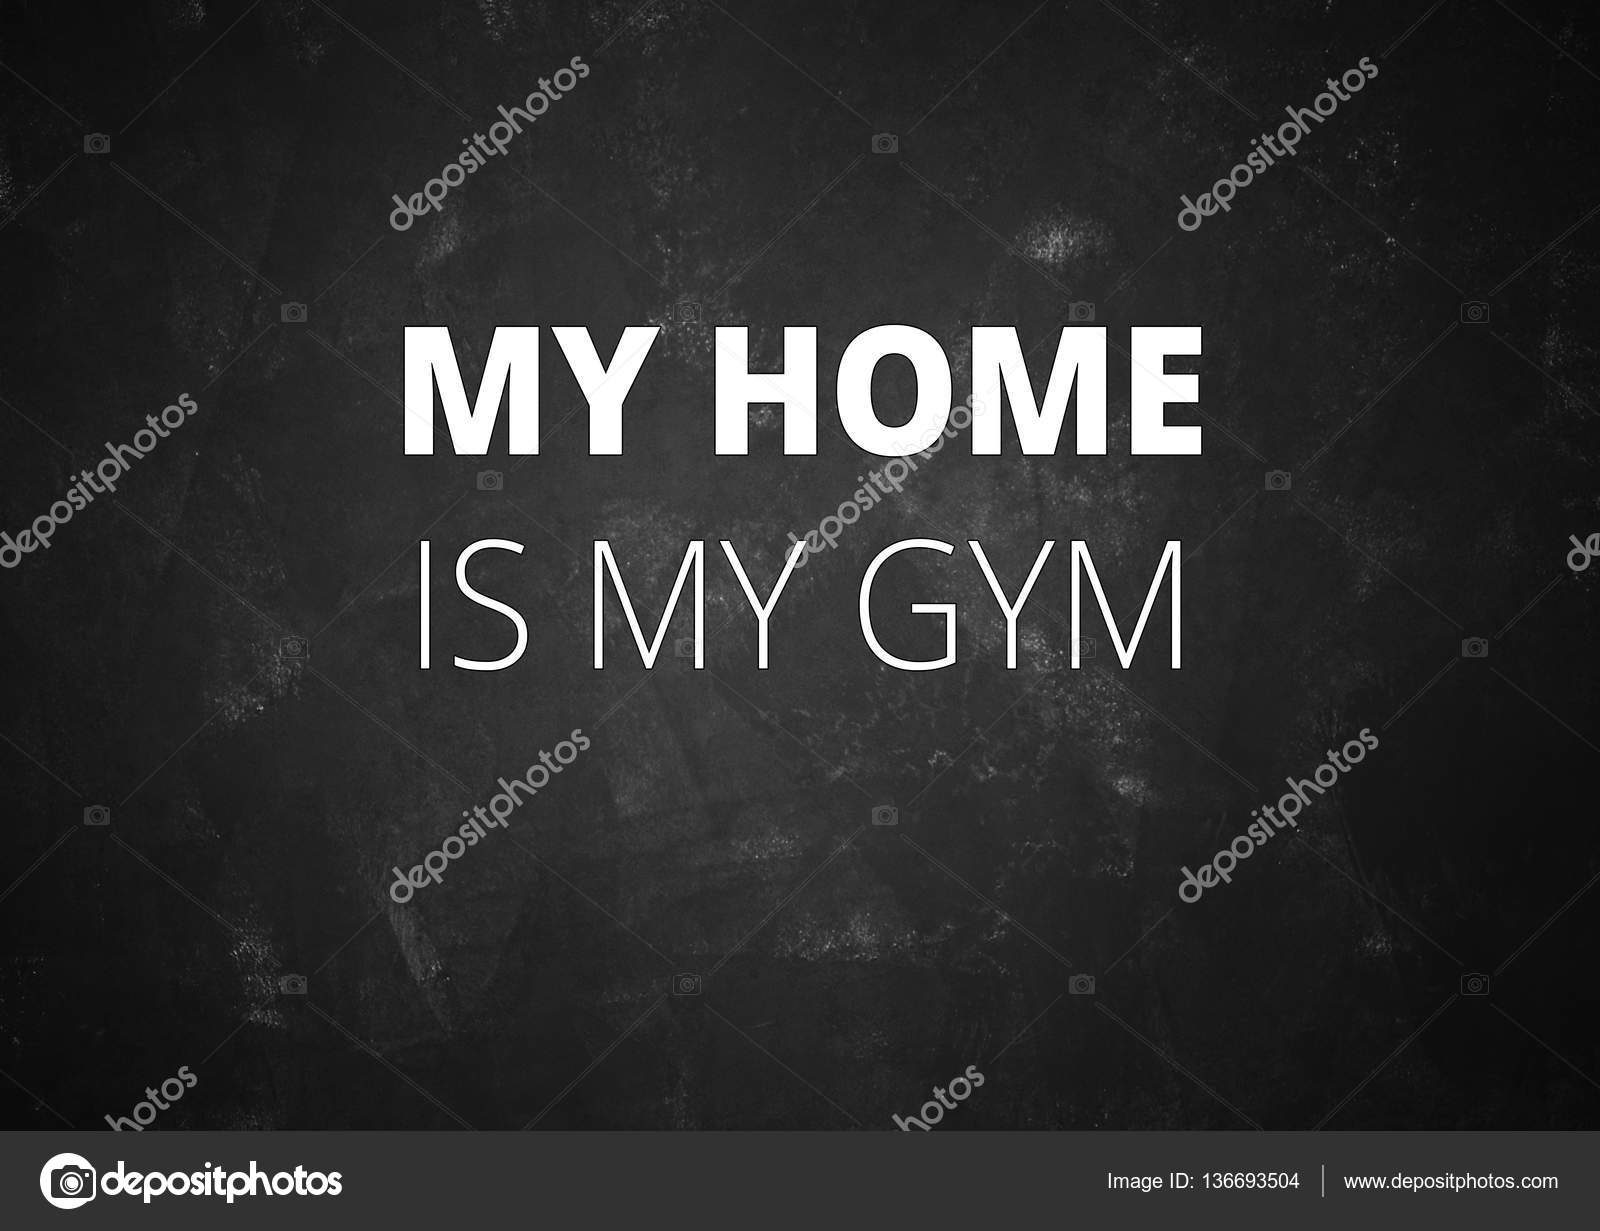 Gym Motivation Quotes Wallpaper Fitness Motivation Quotes Stock Photo C Jakysinka 136693504